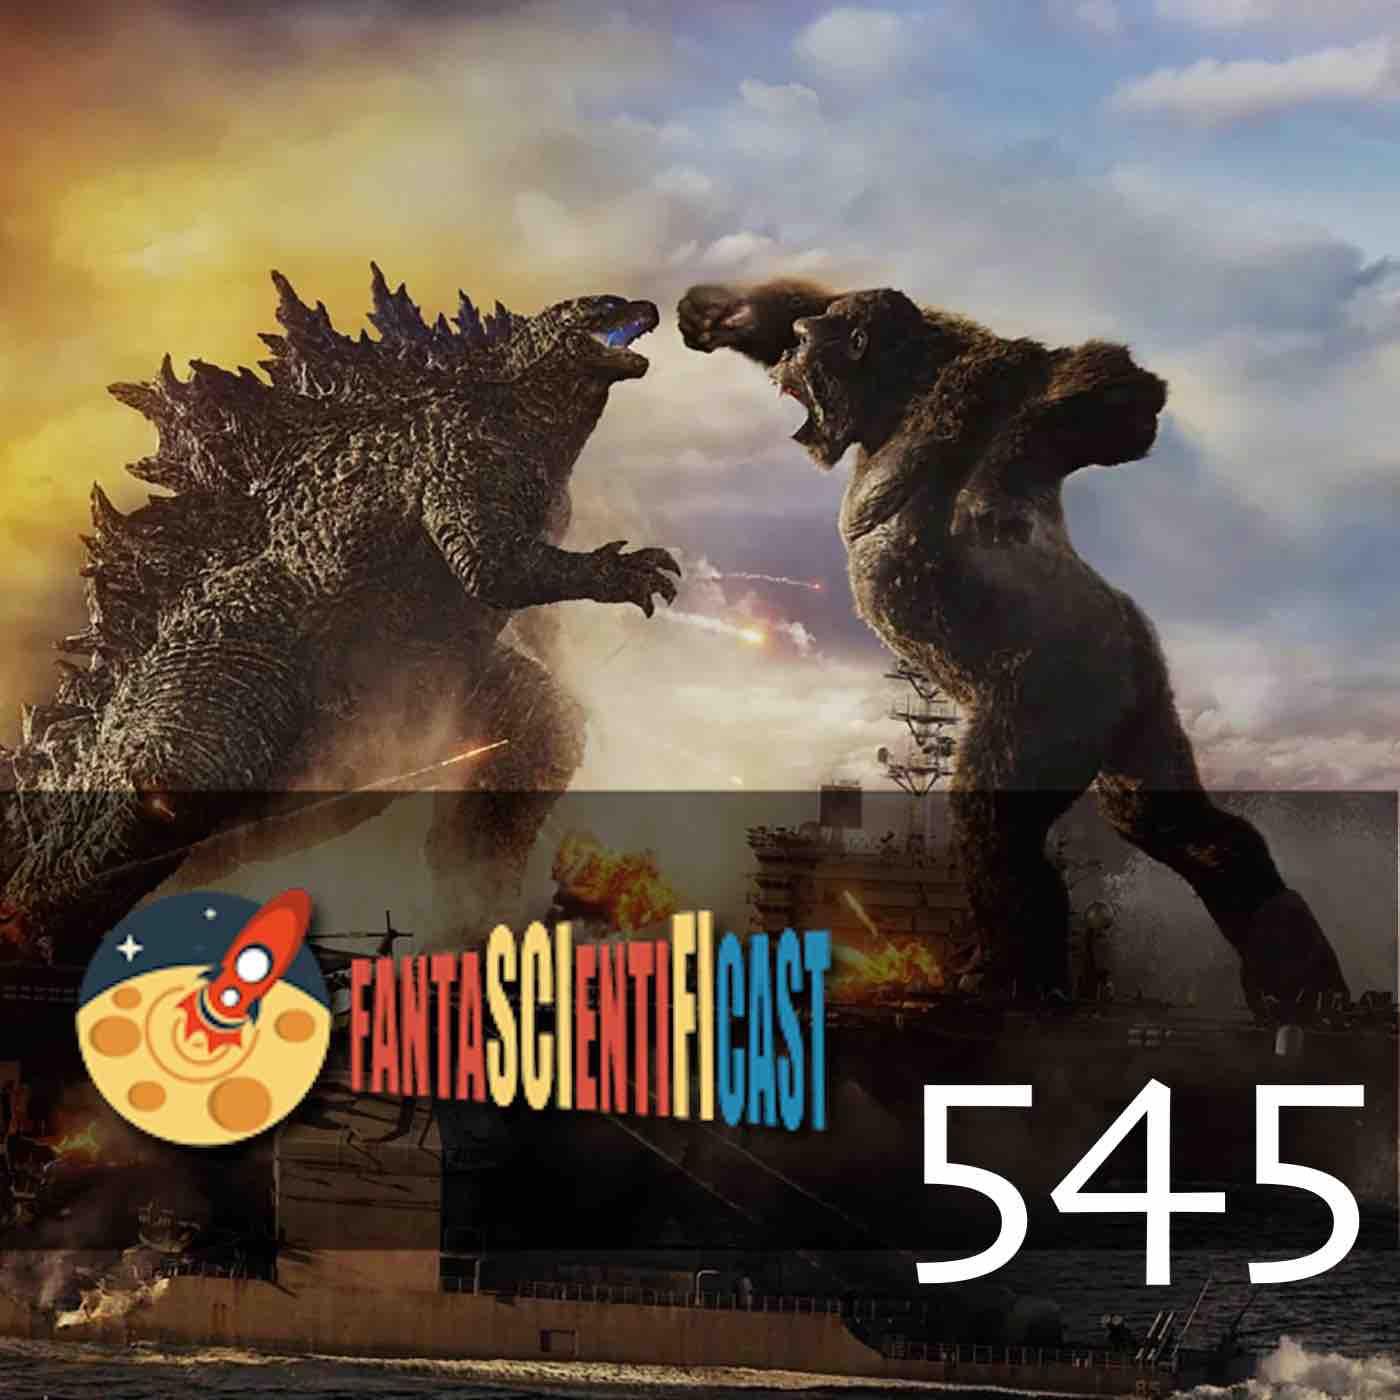 Speciale Godzilla vs. Kong